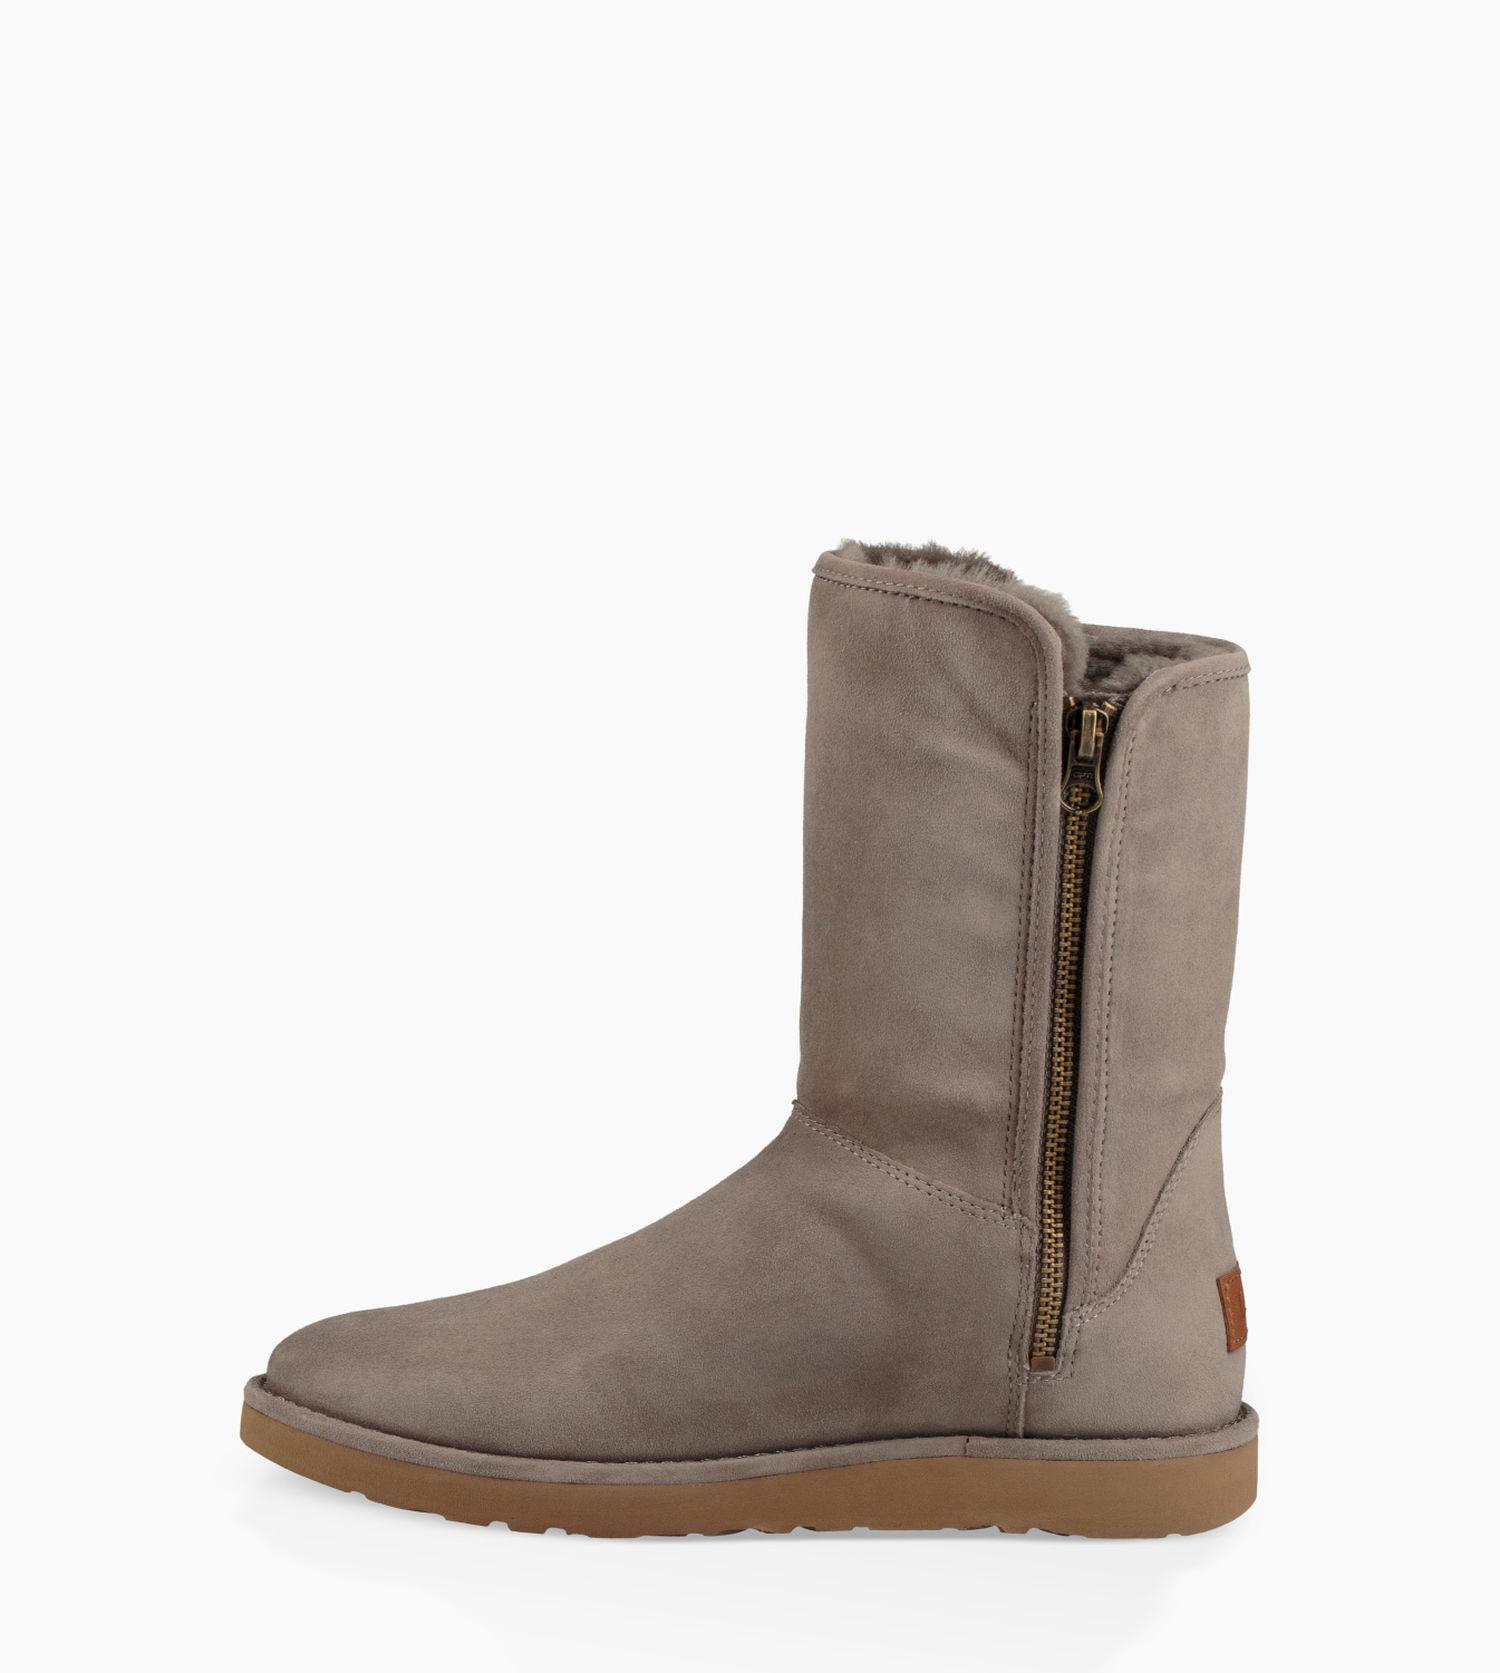 UGG Suede Women's Abree Short Ii Boot in Slate (Brown)